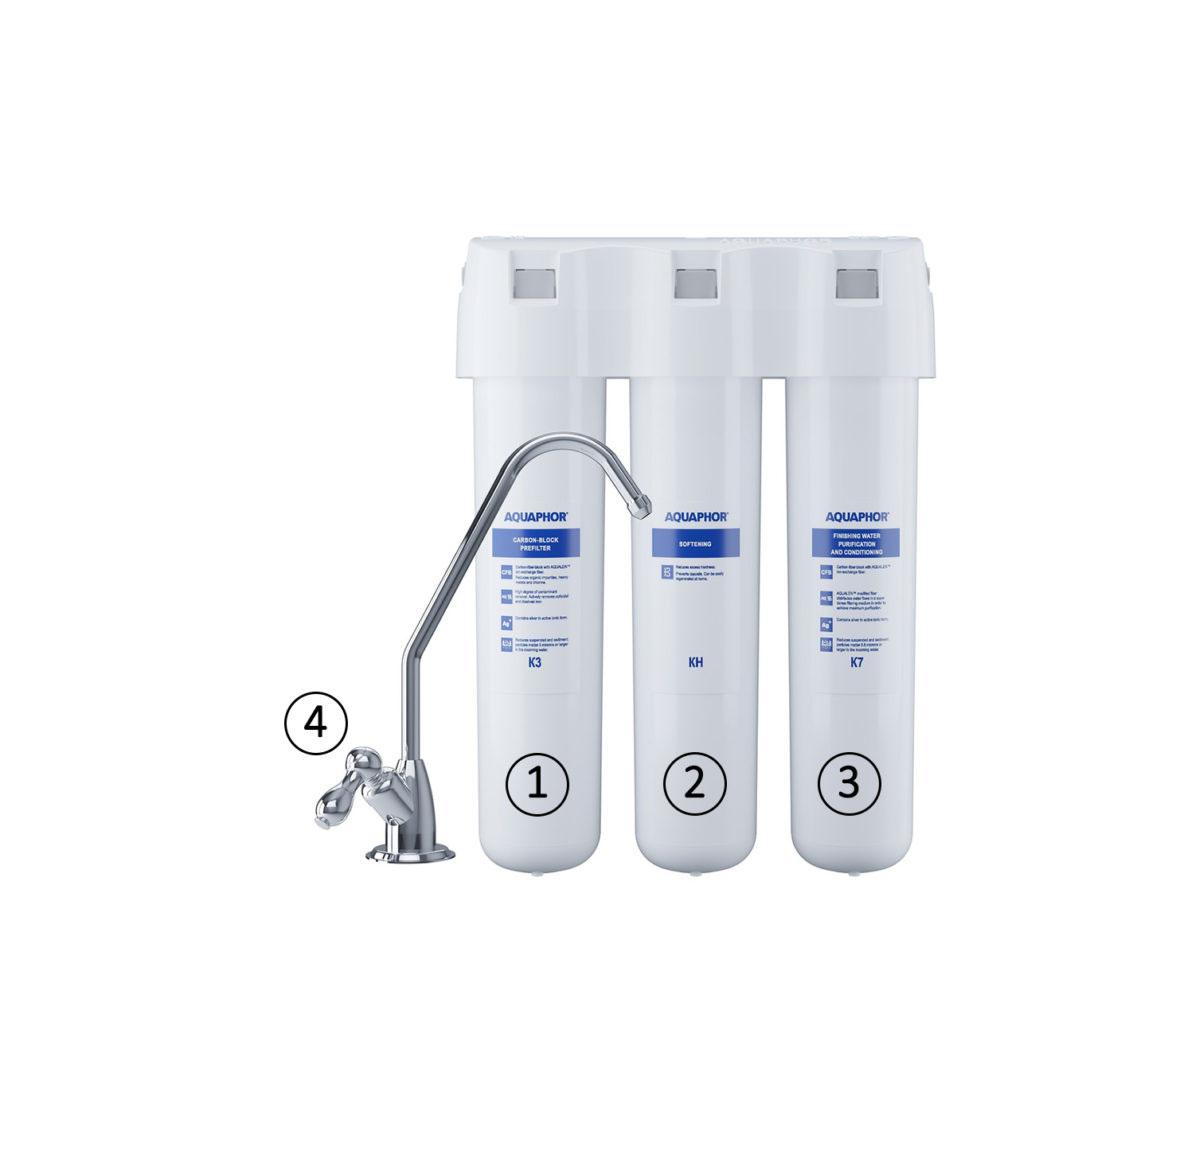 sistem-de-filtrare-in-3-pasi-aquaphor-crystal-h-cu-dedurizare-mfrh-original-scaled-A